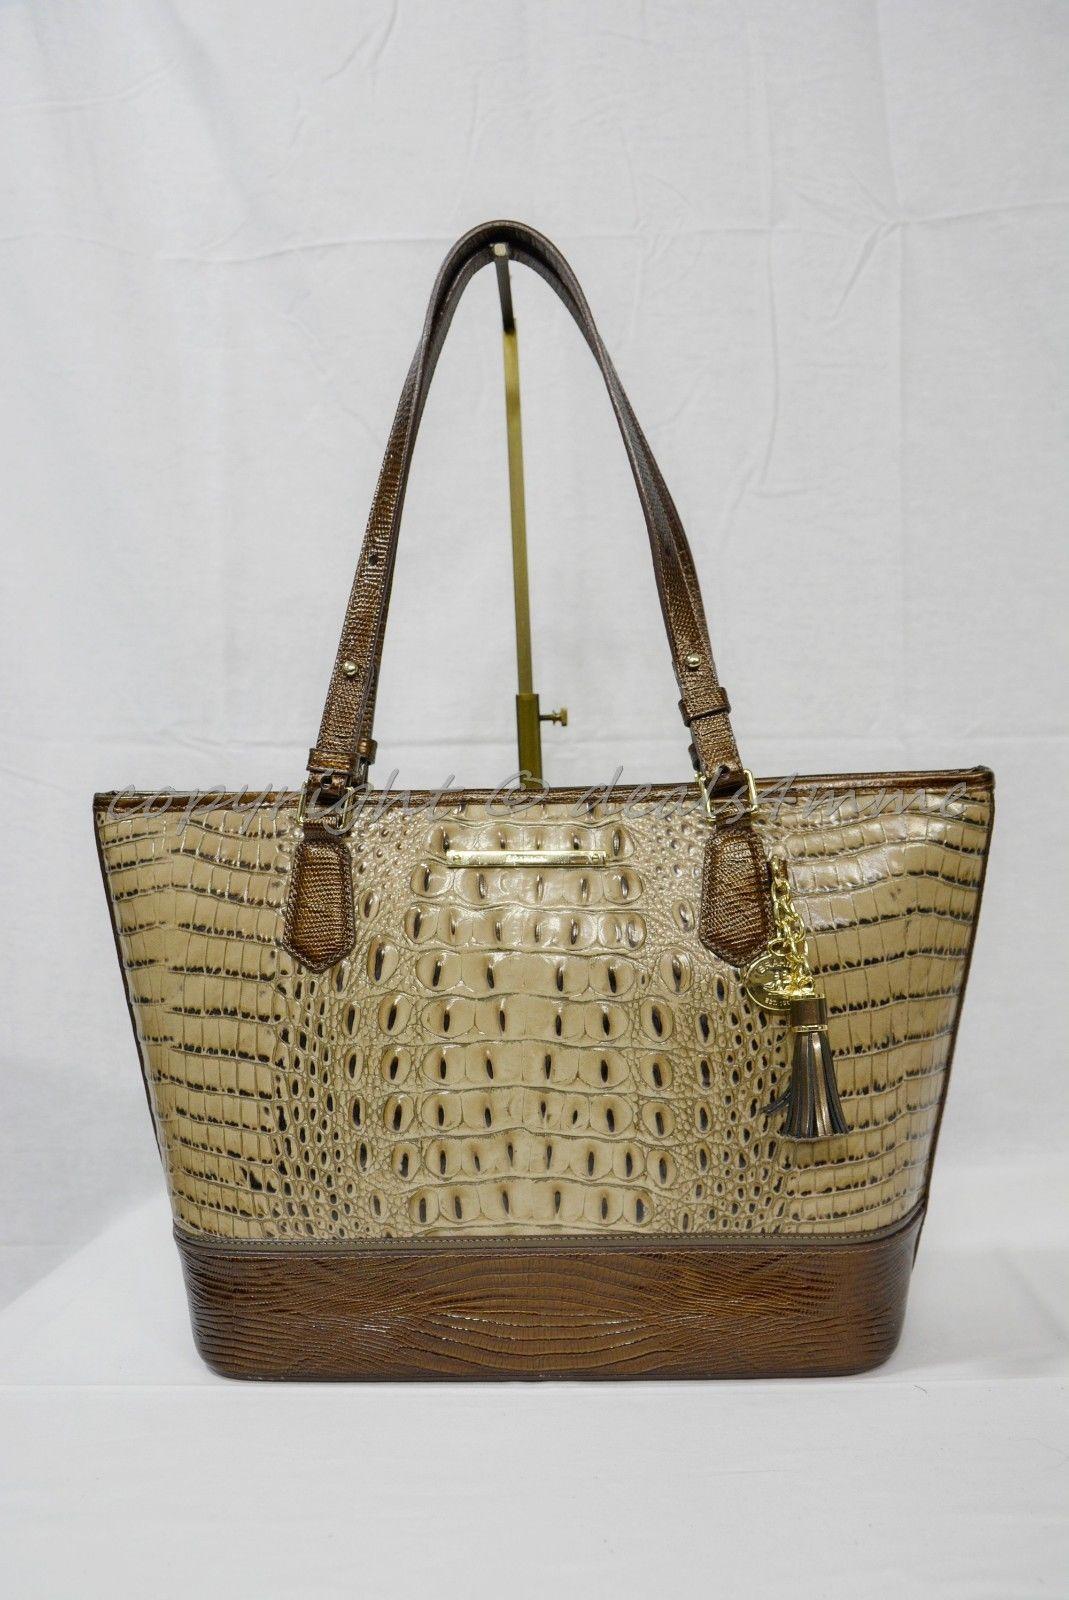 NWT Brahmin Medium Asher Leather Tote/Shoulder Bag Barley Bronte - Beige Brown image 2